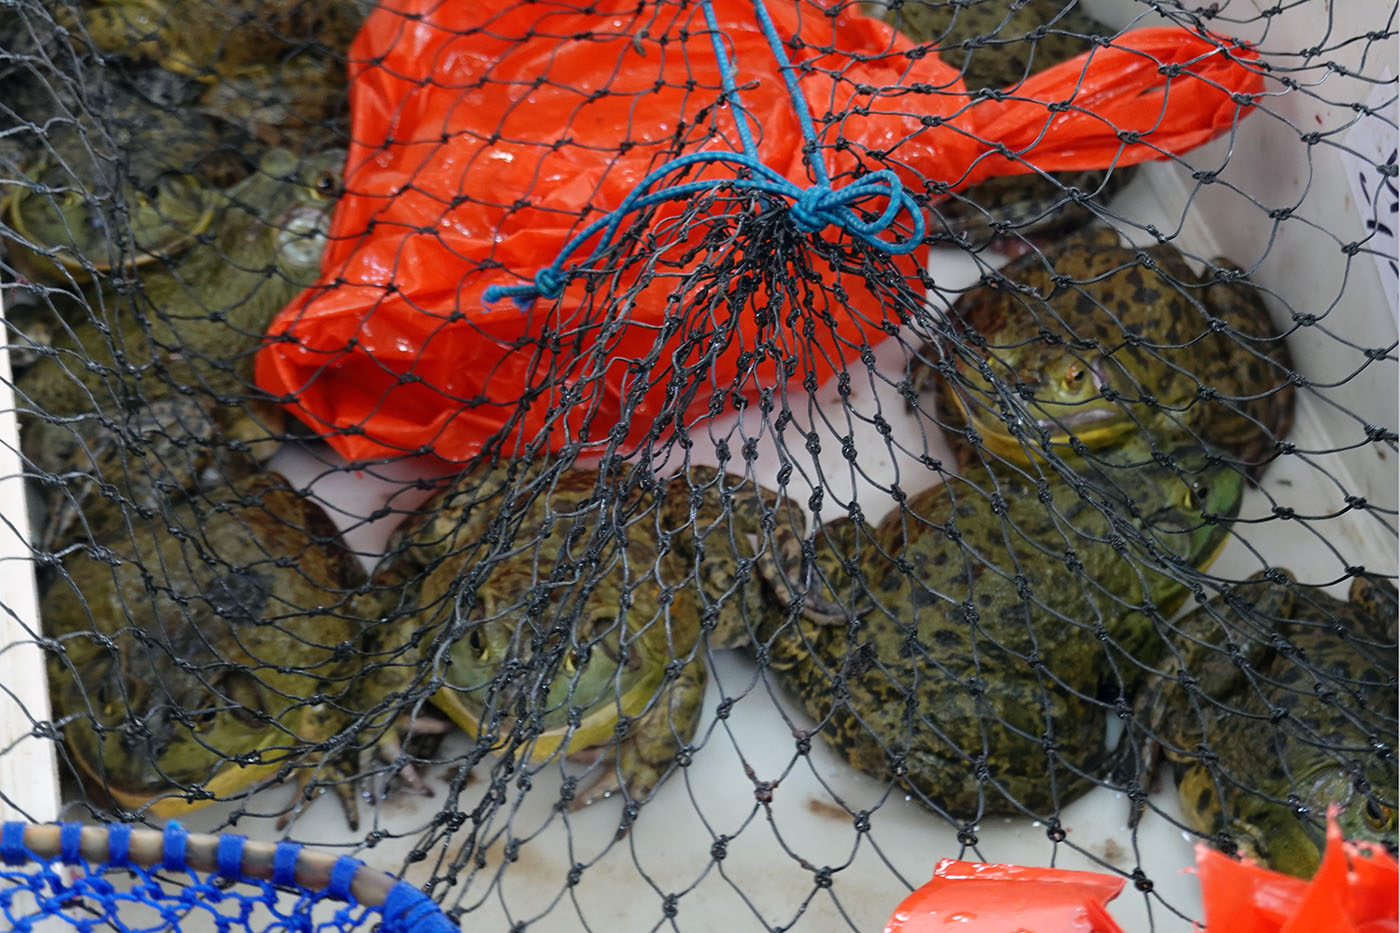 朱家角市場の蛙